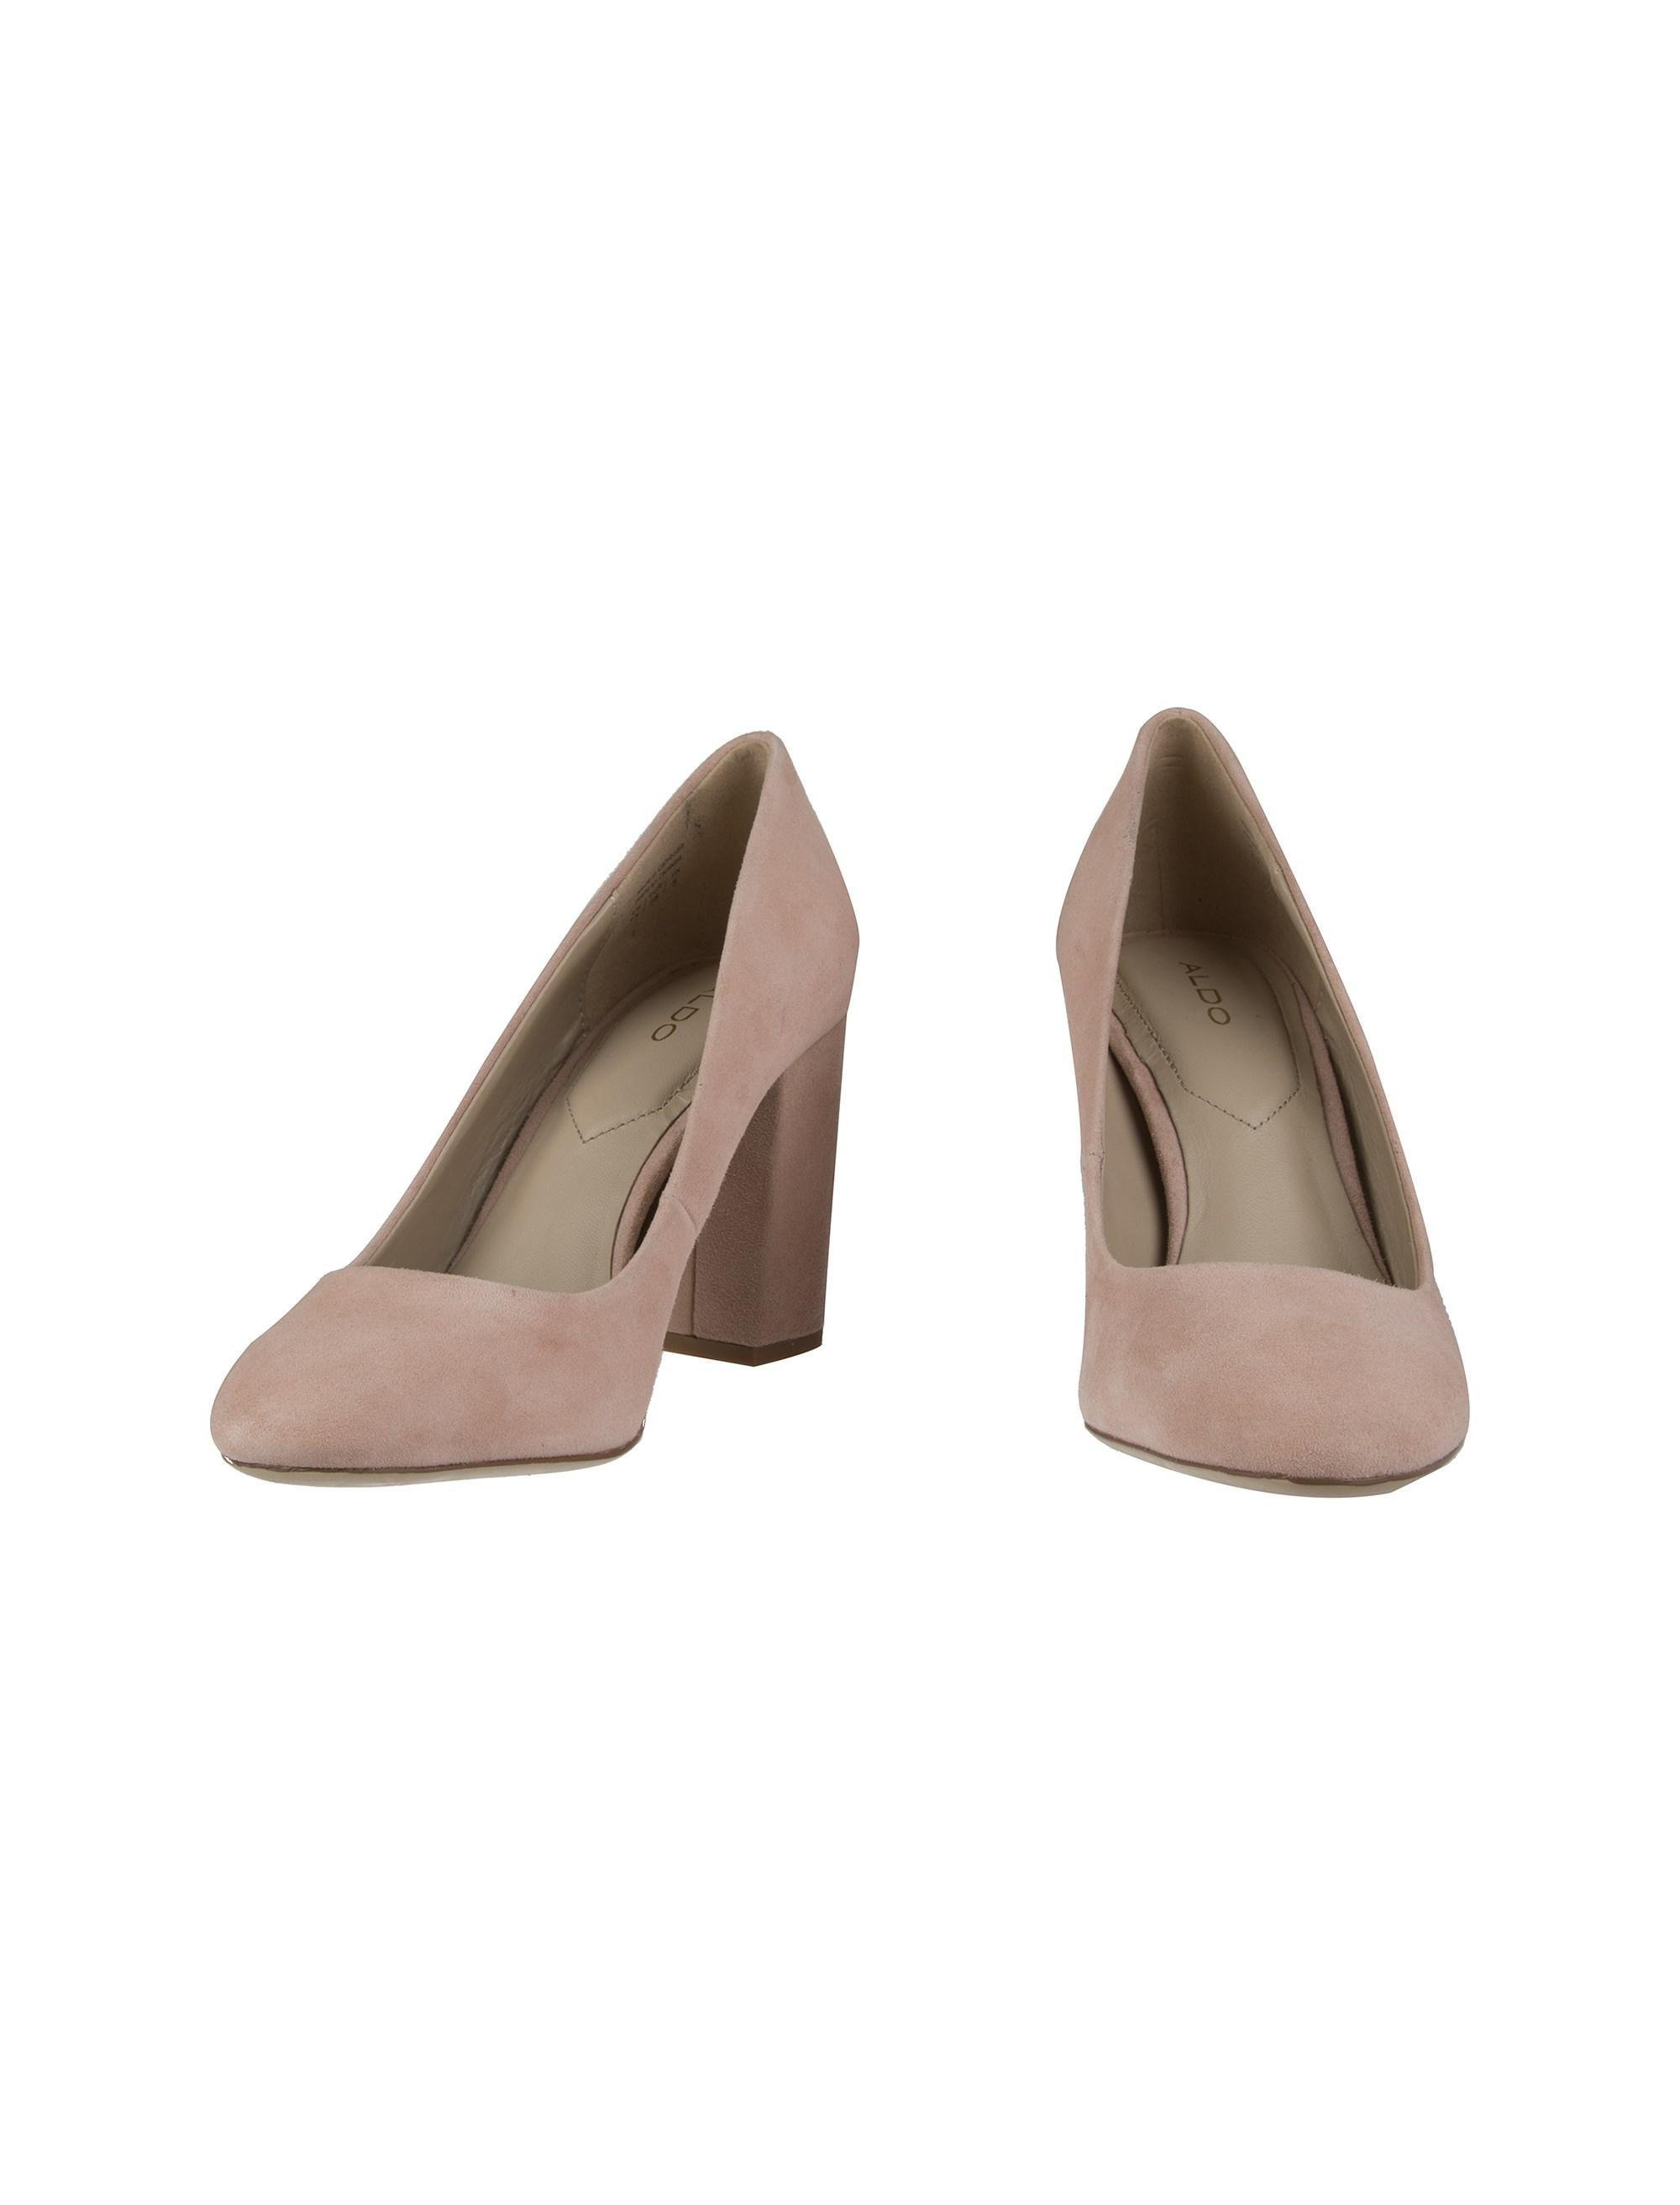 کفش پاشنه بلند جیر زنانه - صورتي - 4